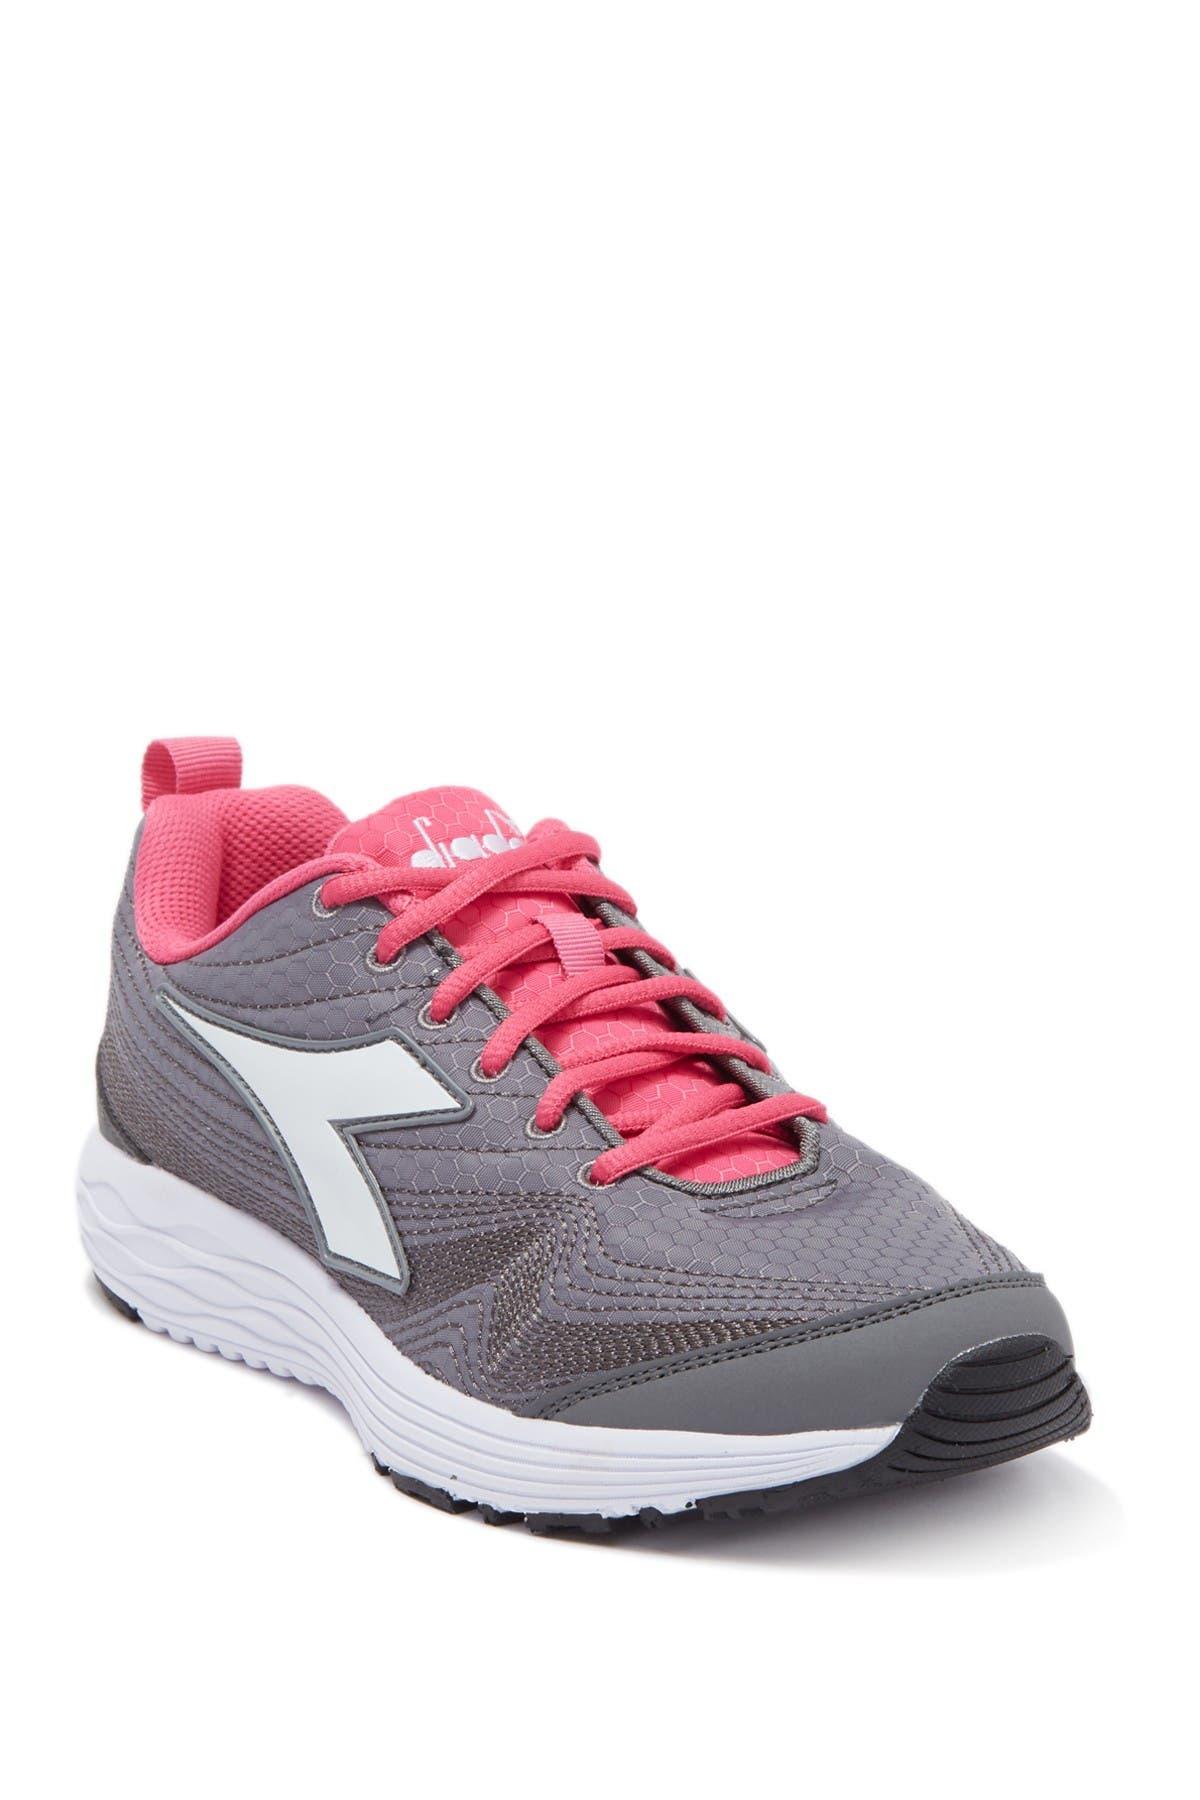 Image of Diadora Flamingo Water Resistant Running Shoe